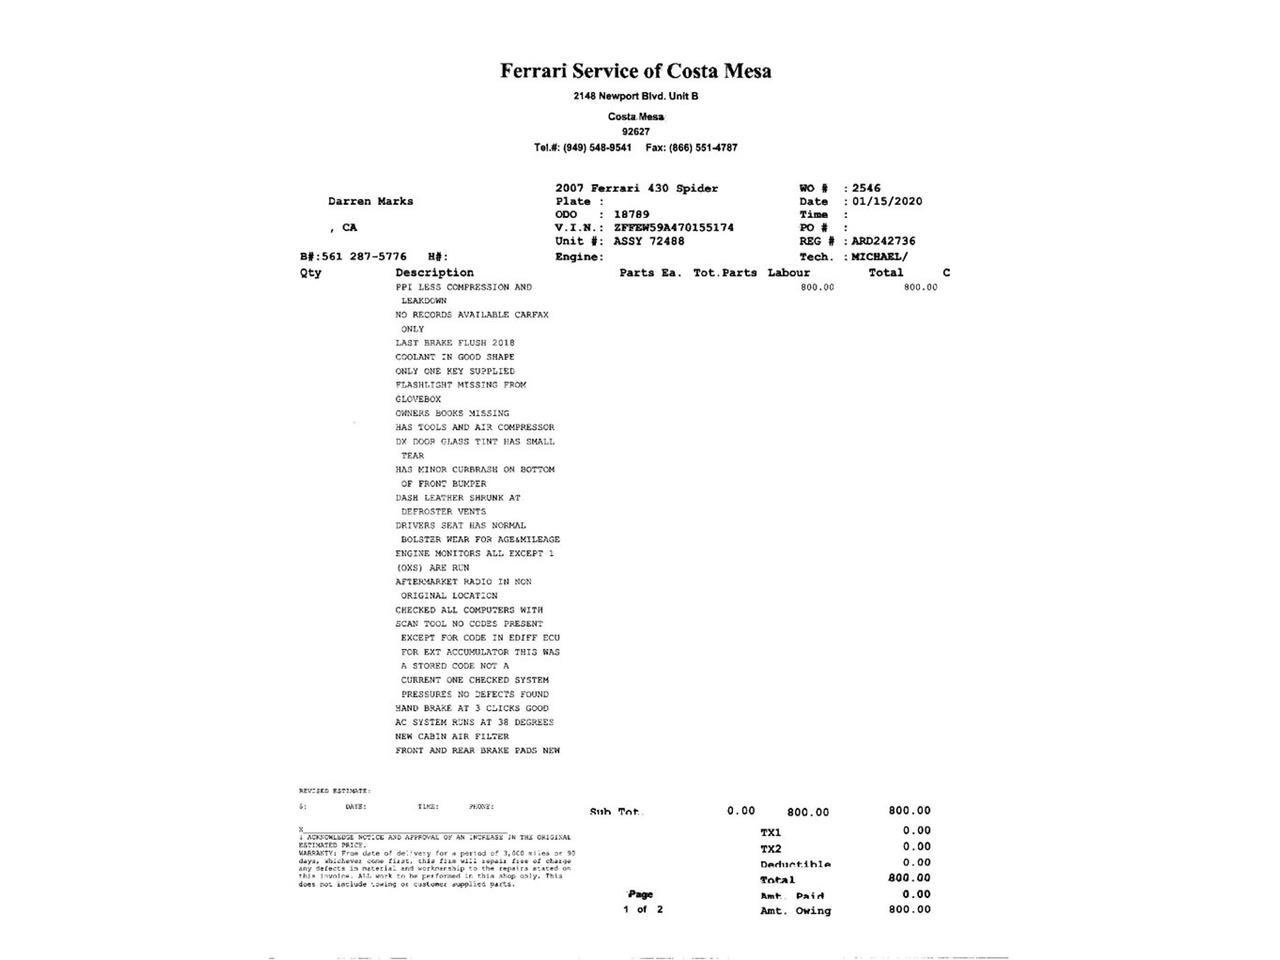 2007 Ferrari 430 (CC-1188559) for sale in Laguna Beach, California